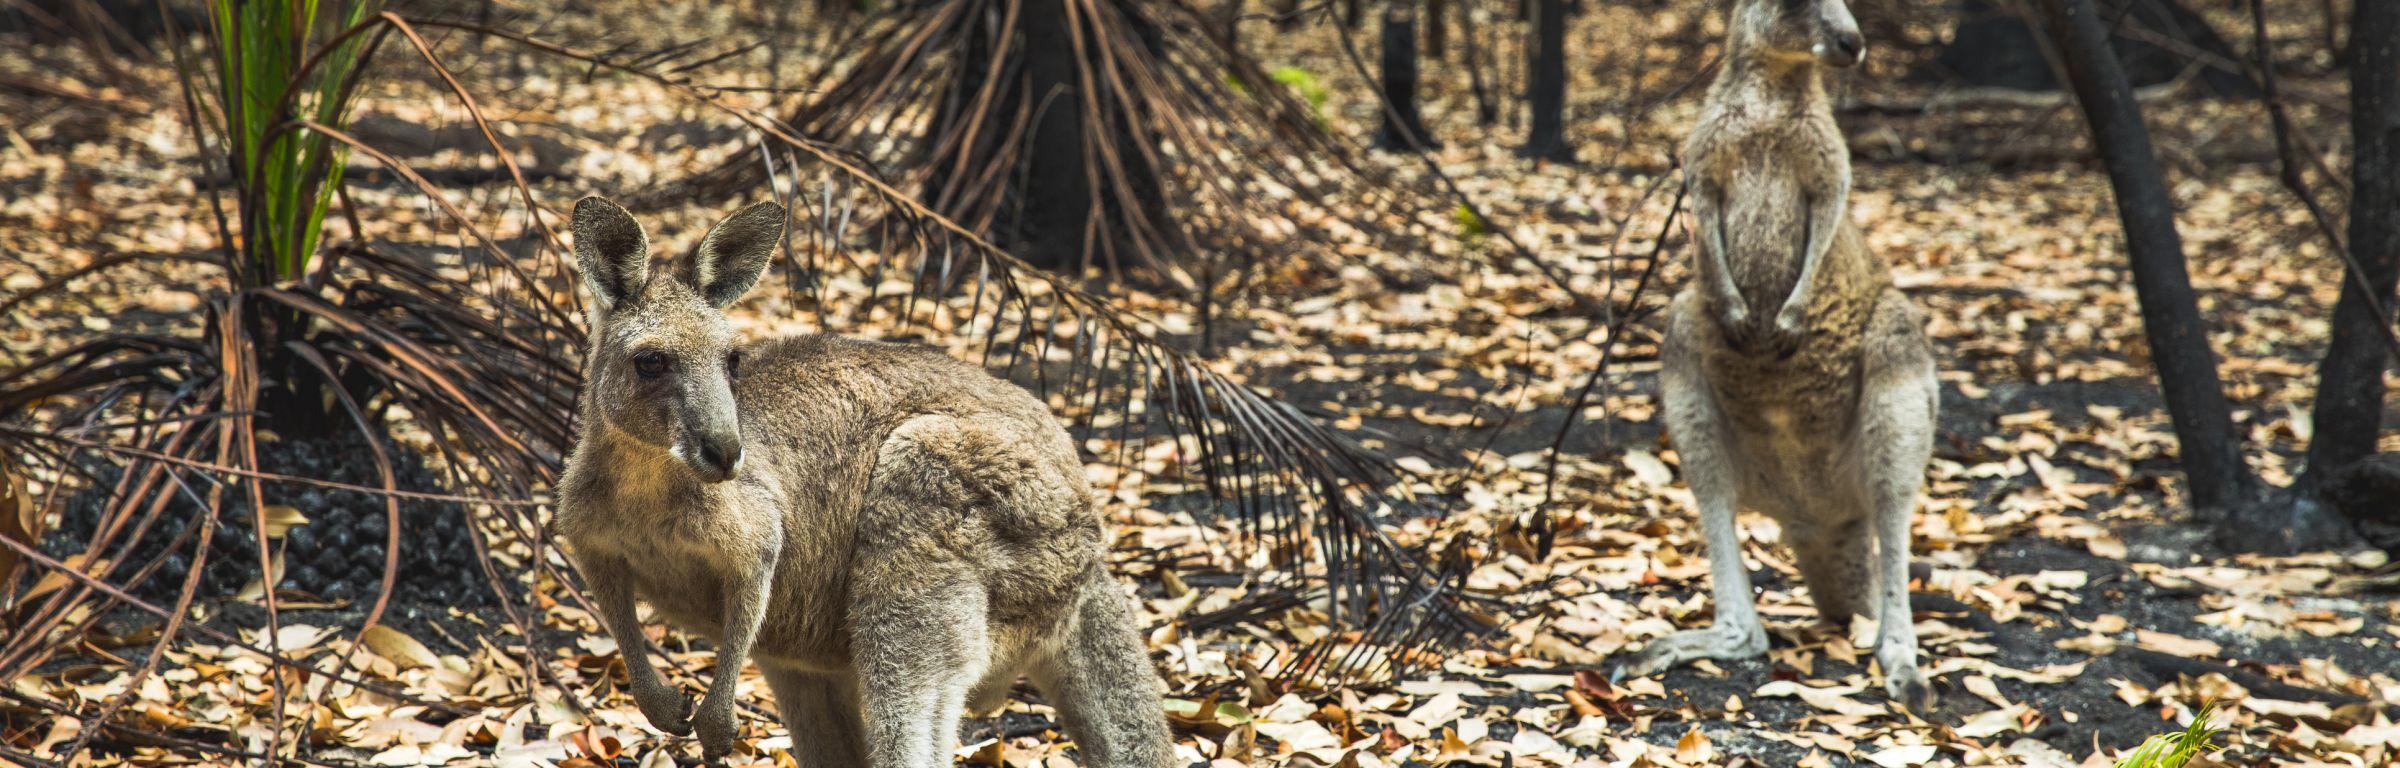 Kangaroos in burnt forest after bushfires swept through during an Australian summer.